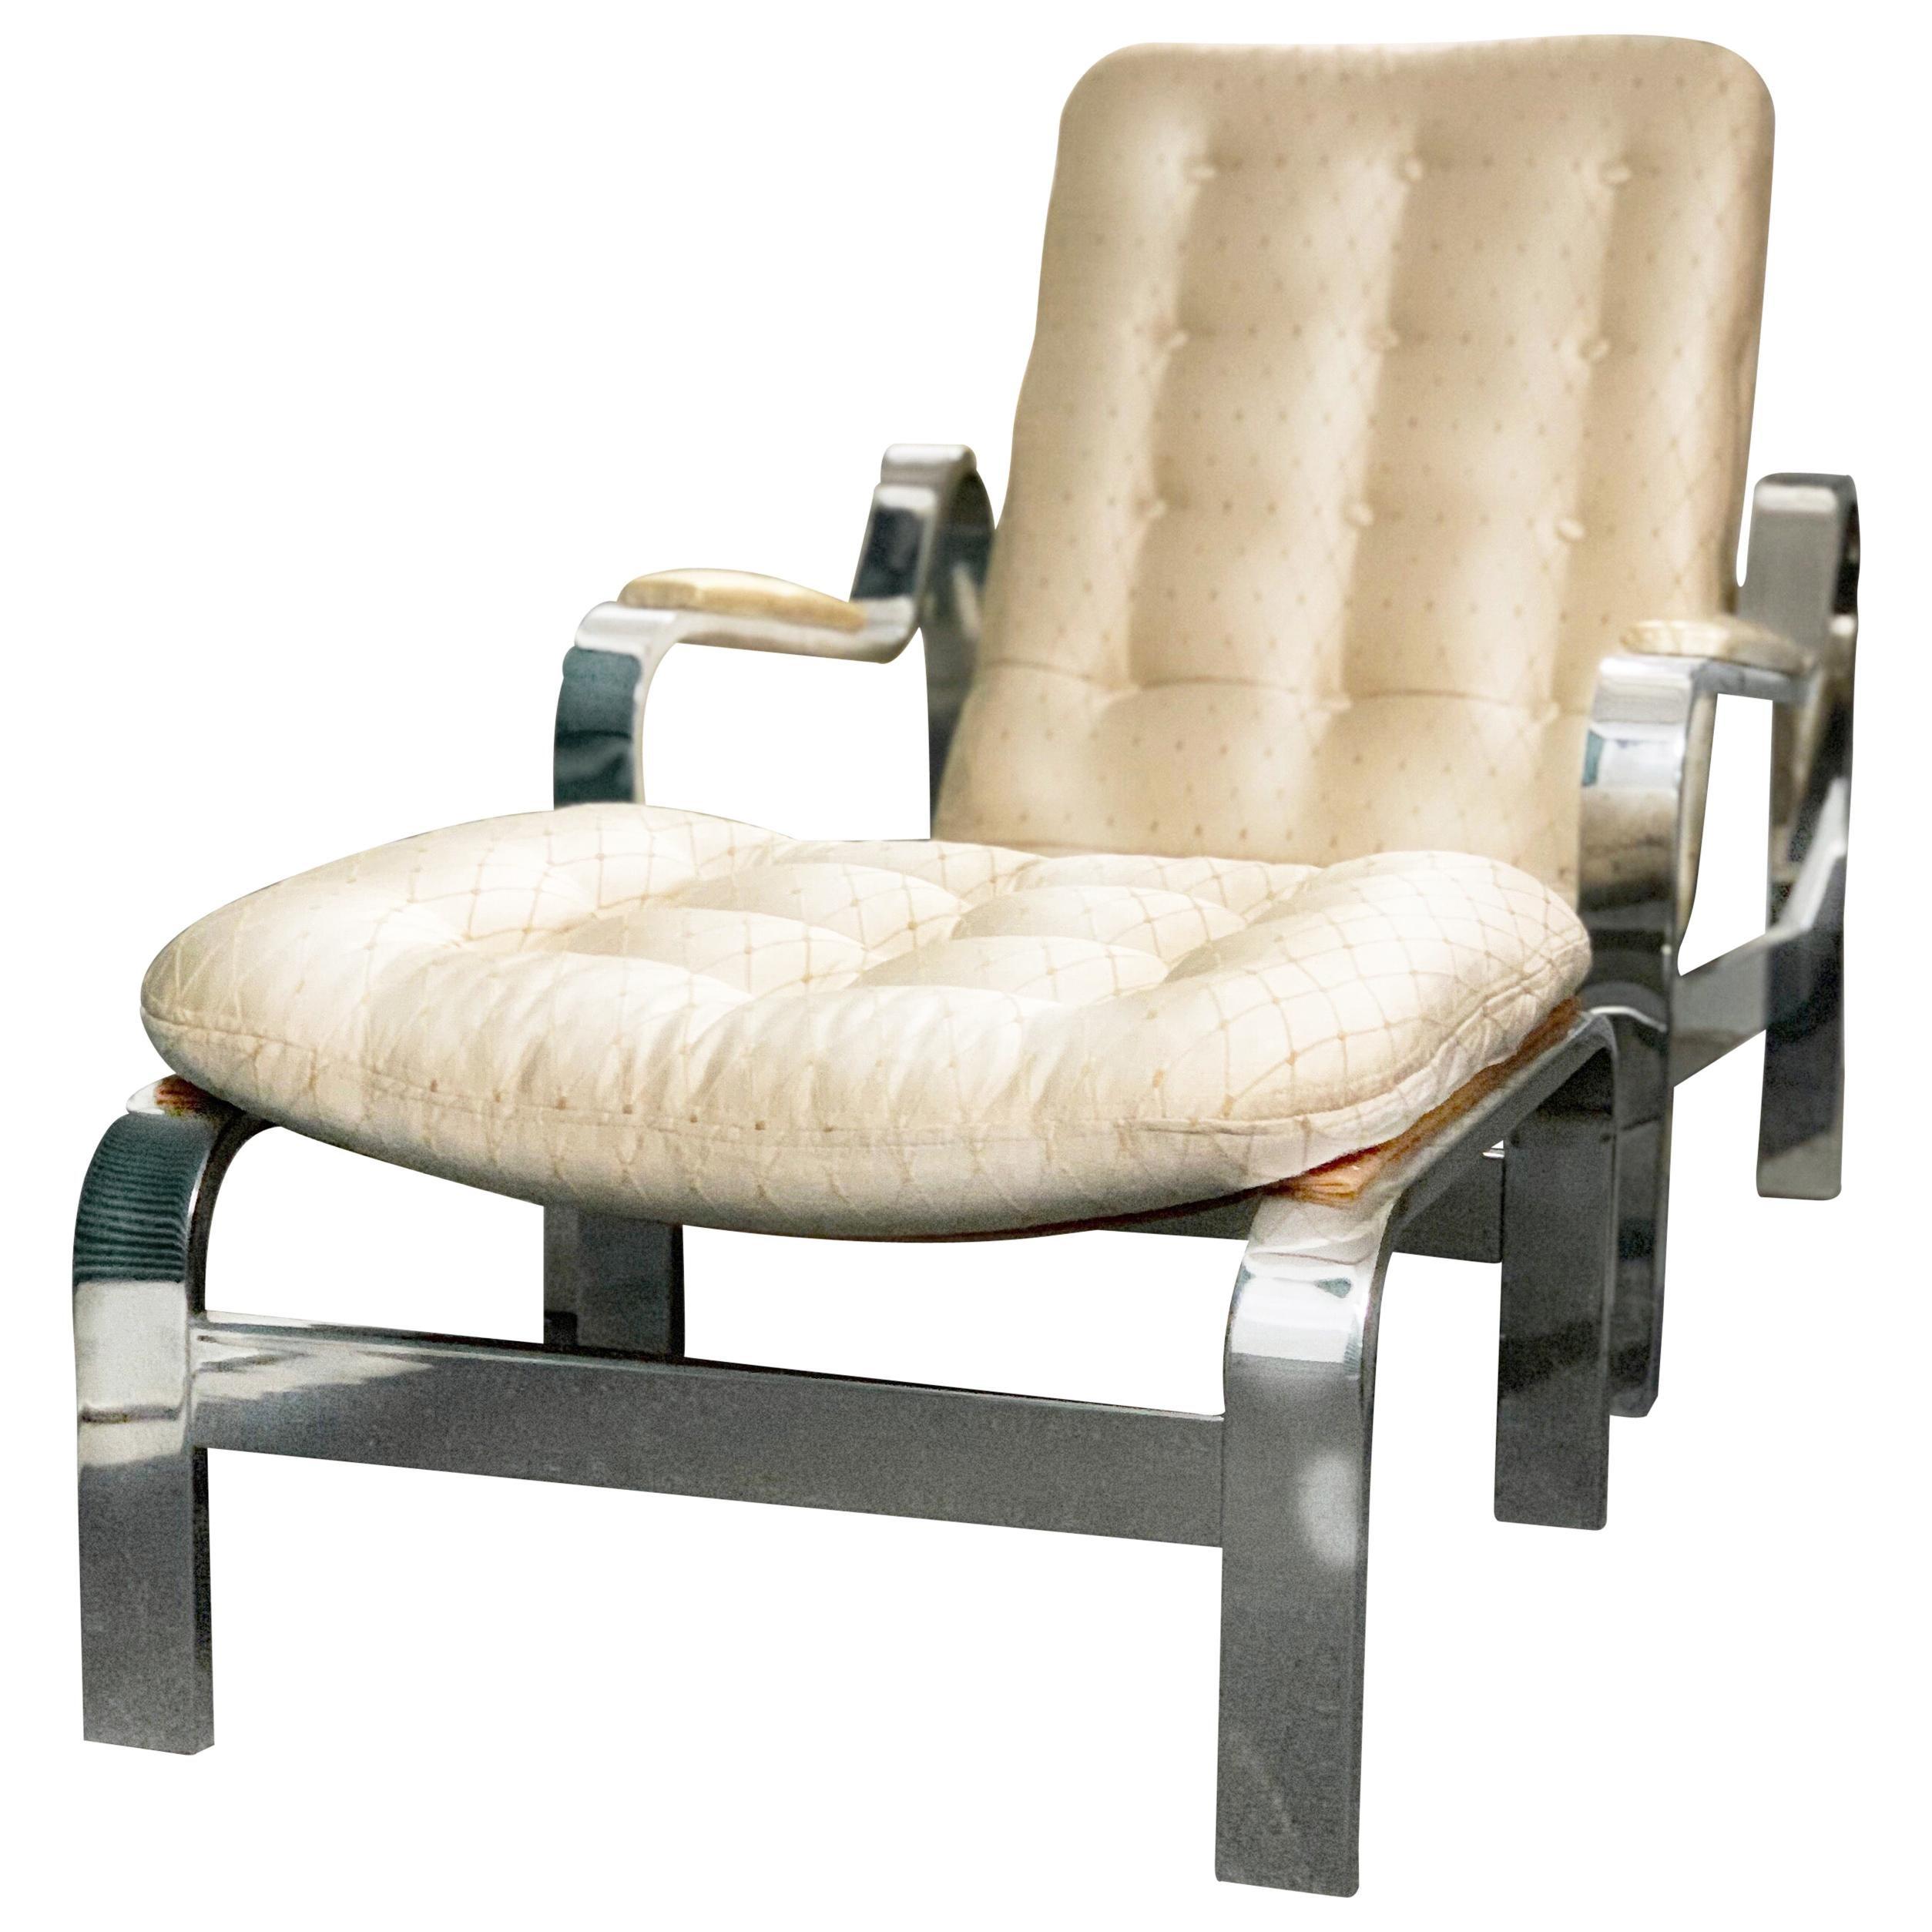 Mid-Century Modern Steel Reclining Lounge Chair Ottoman